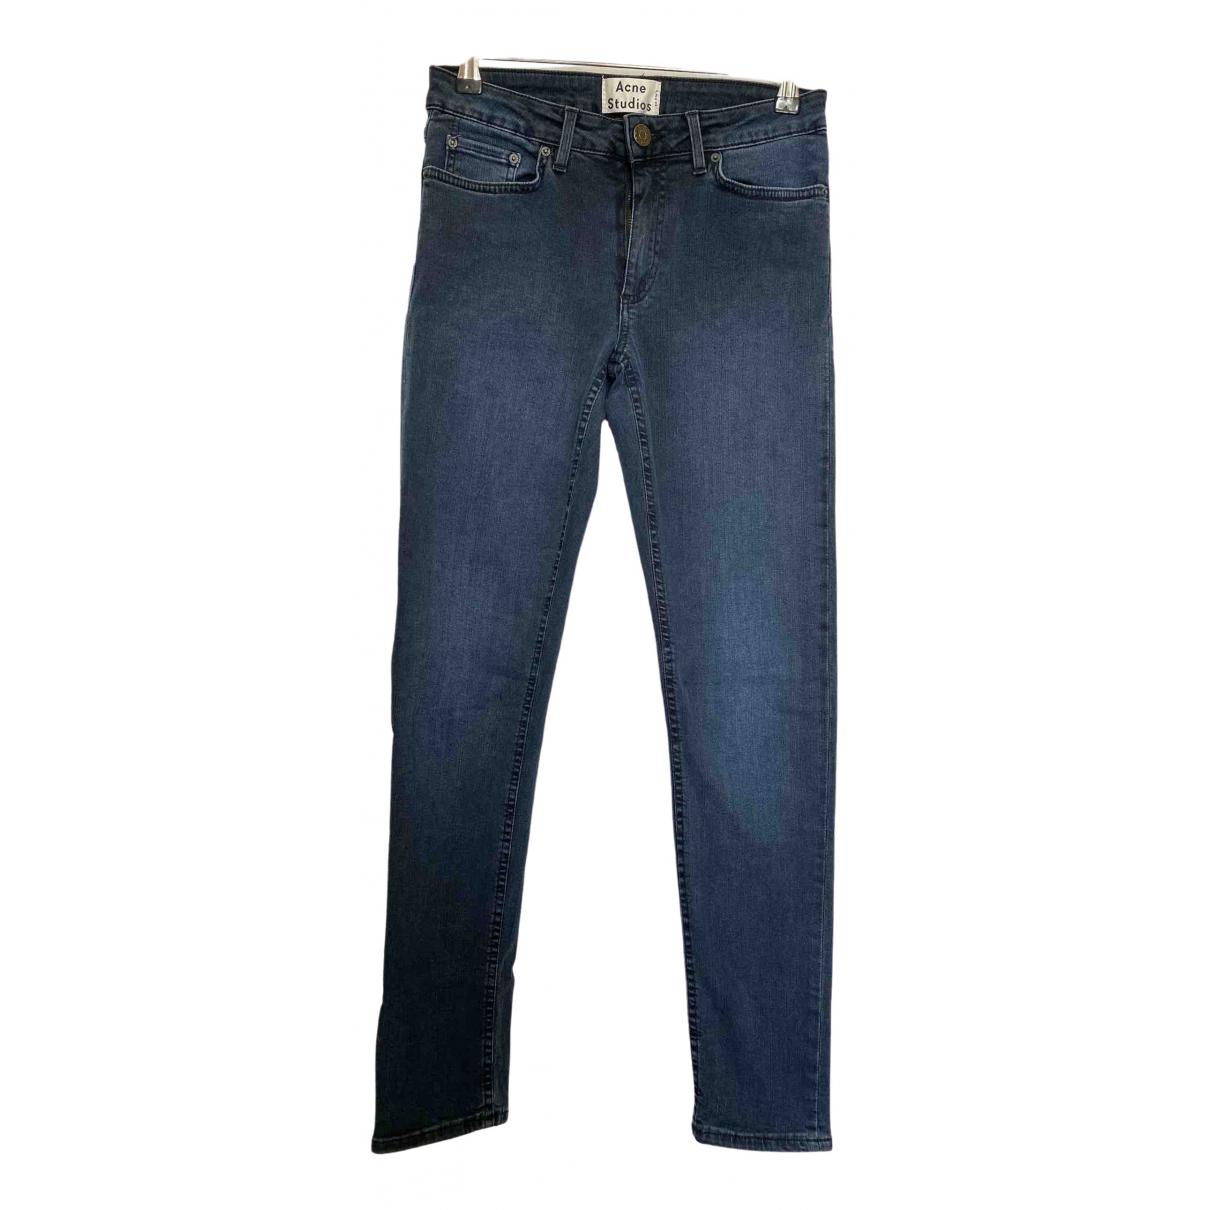 Acne Studios Skin 5 Blue Cotton Jeans for Women 26 US